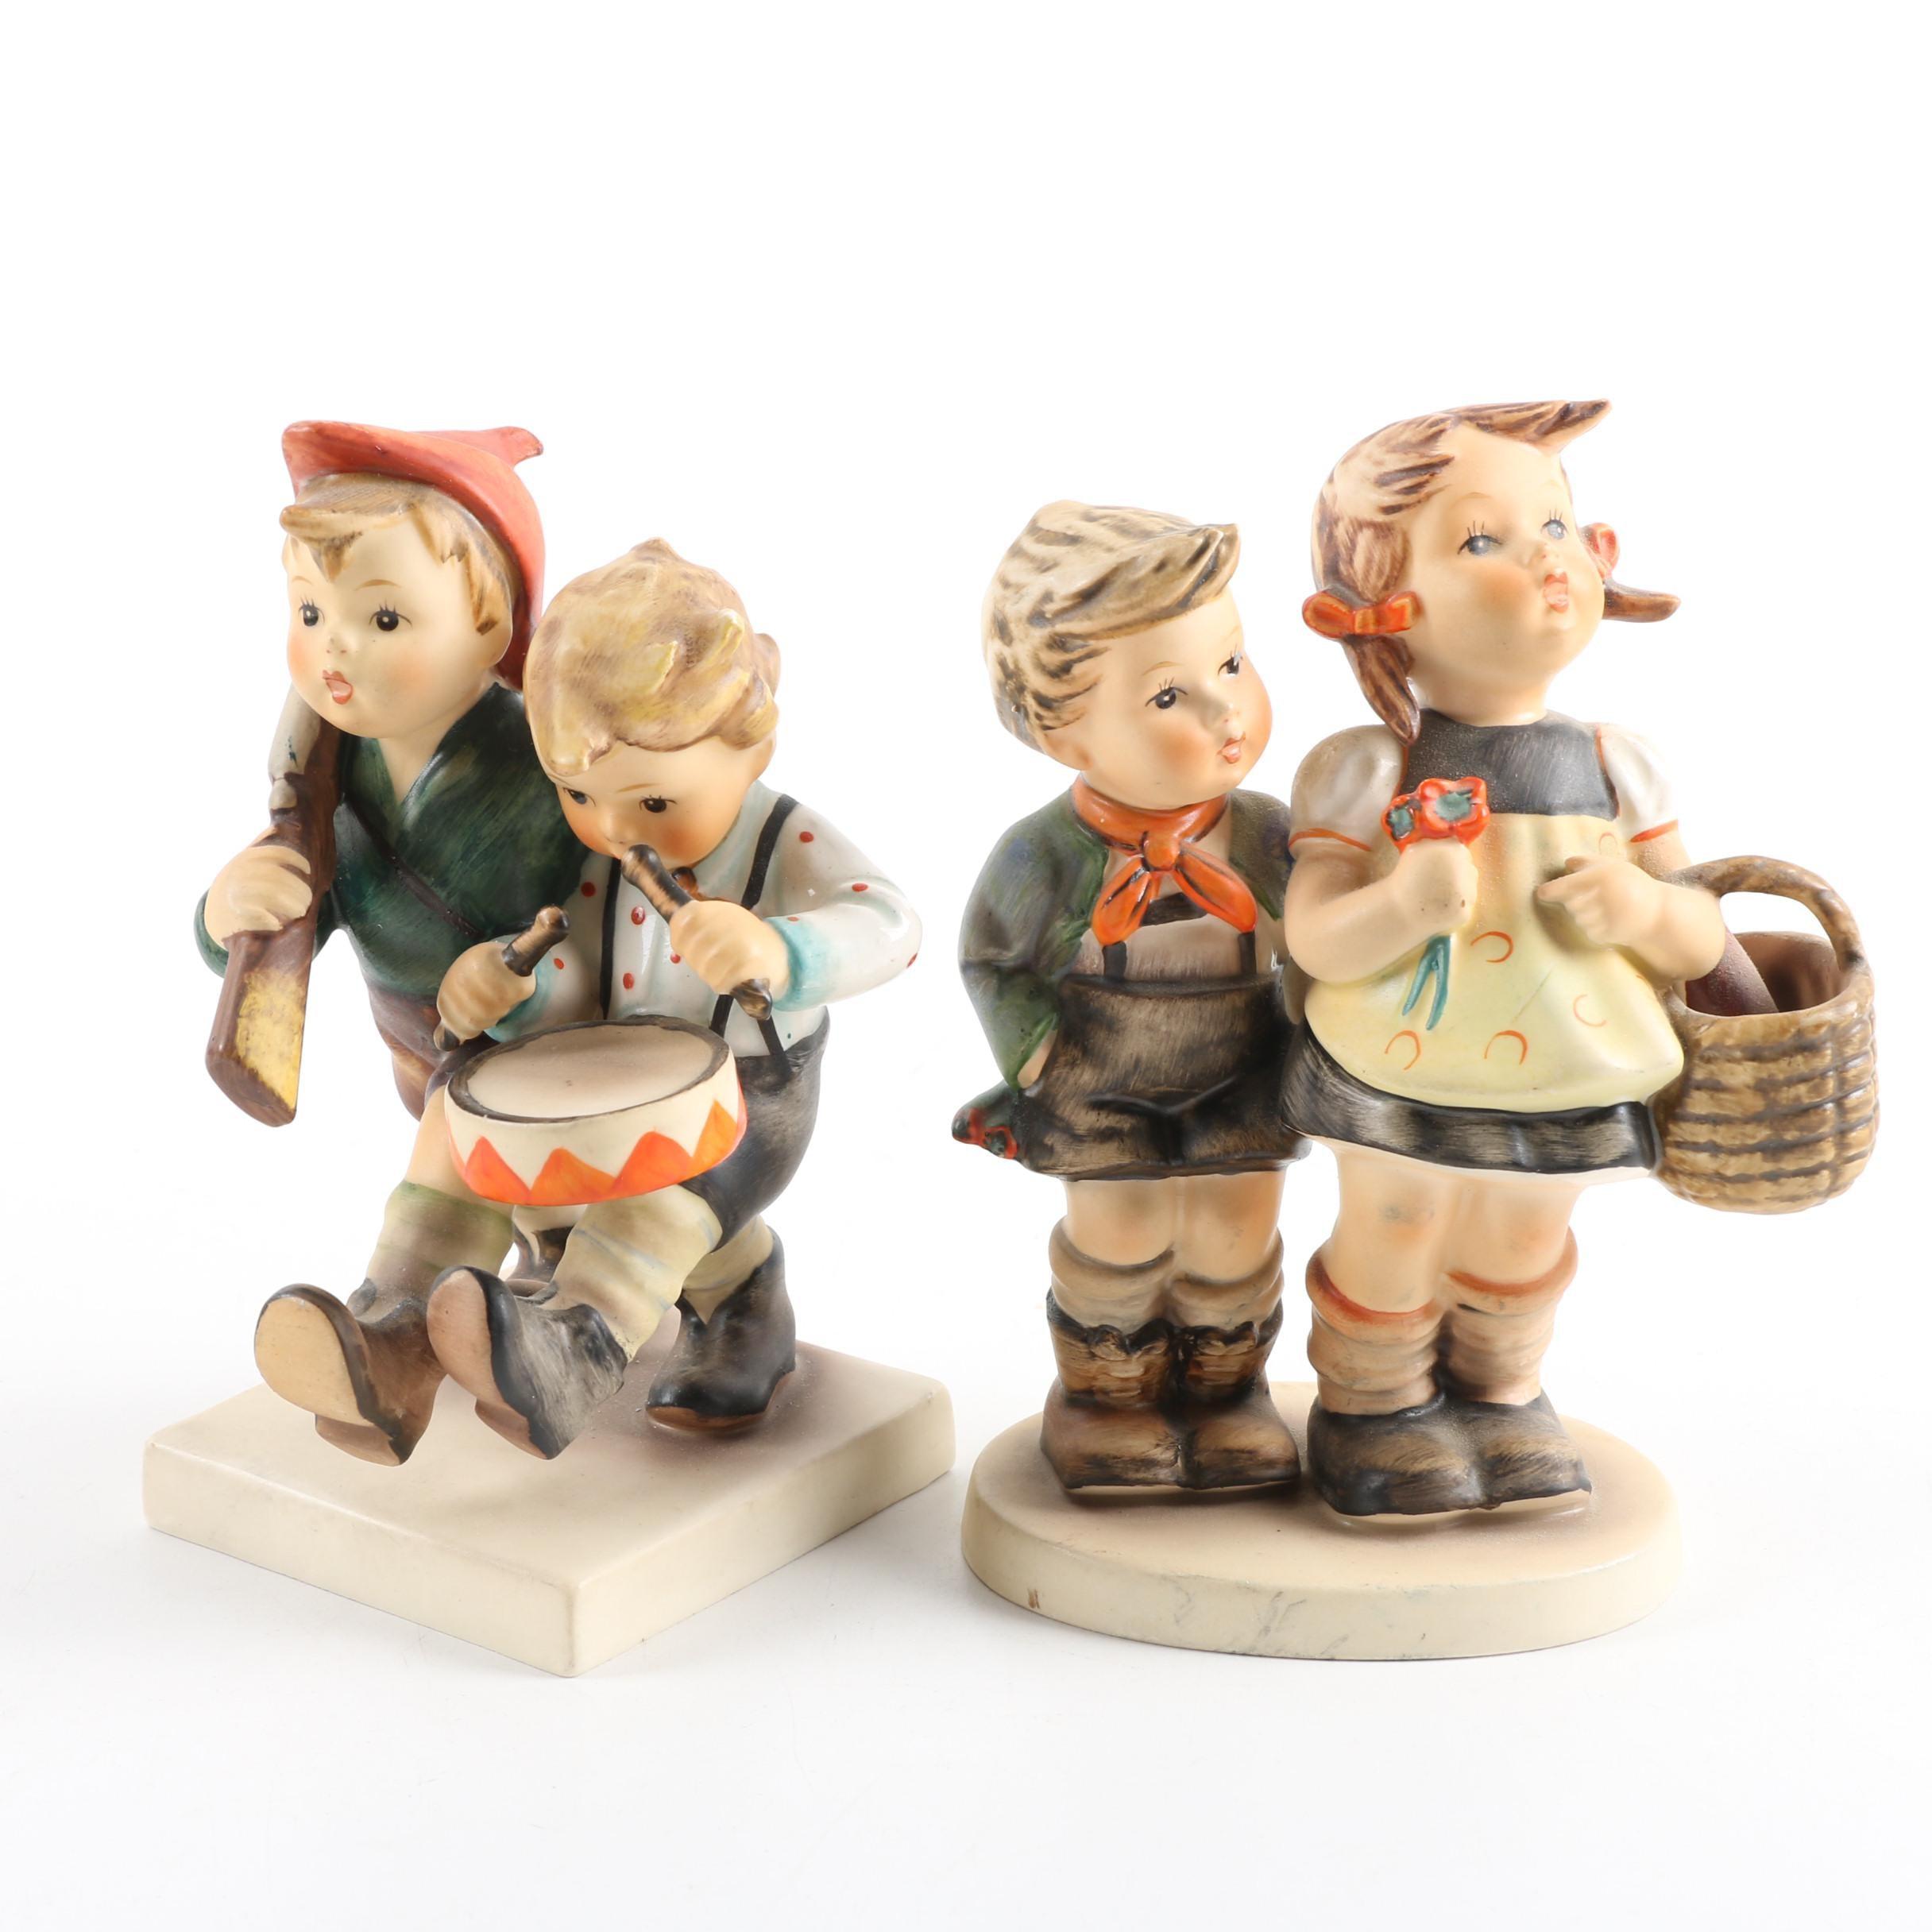 "Hummel ""To Market"" and ""Volunteers"" Figurines"